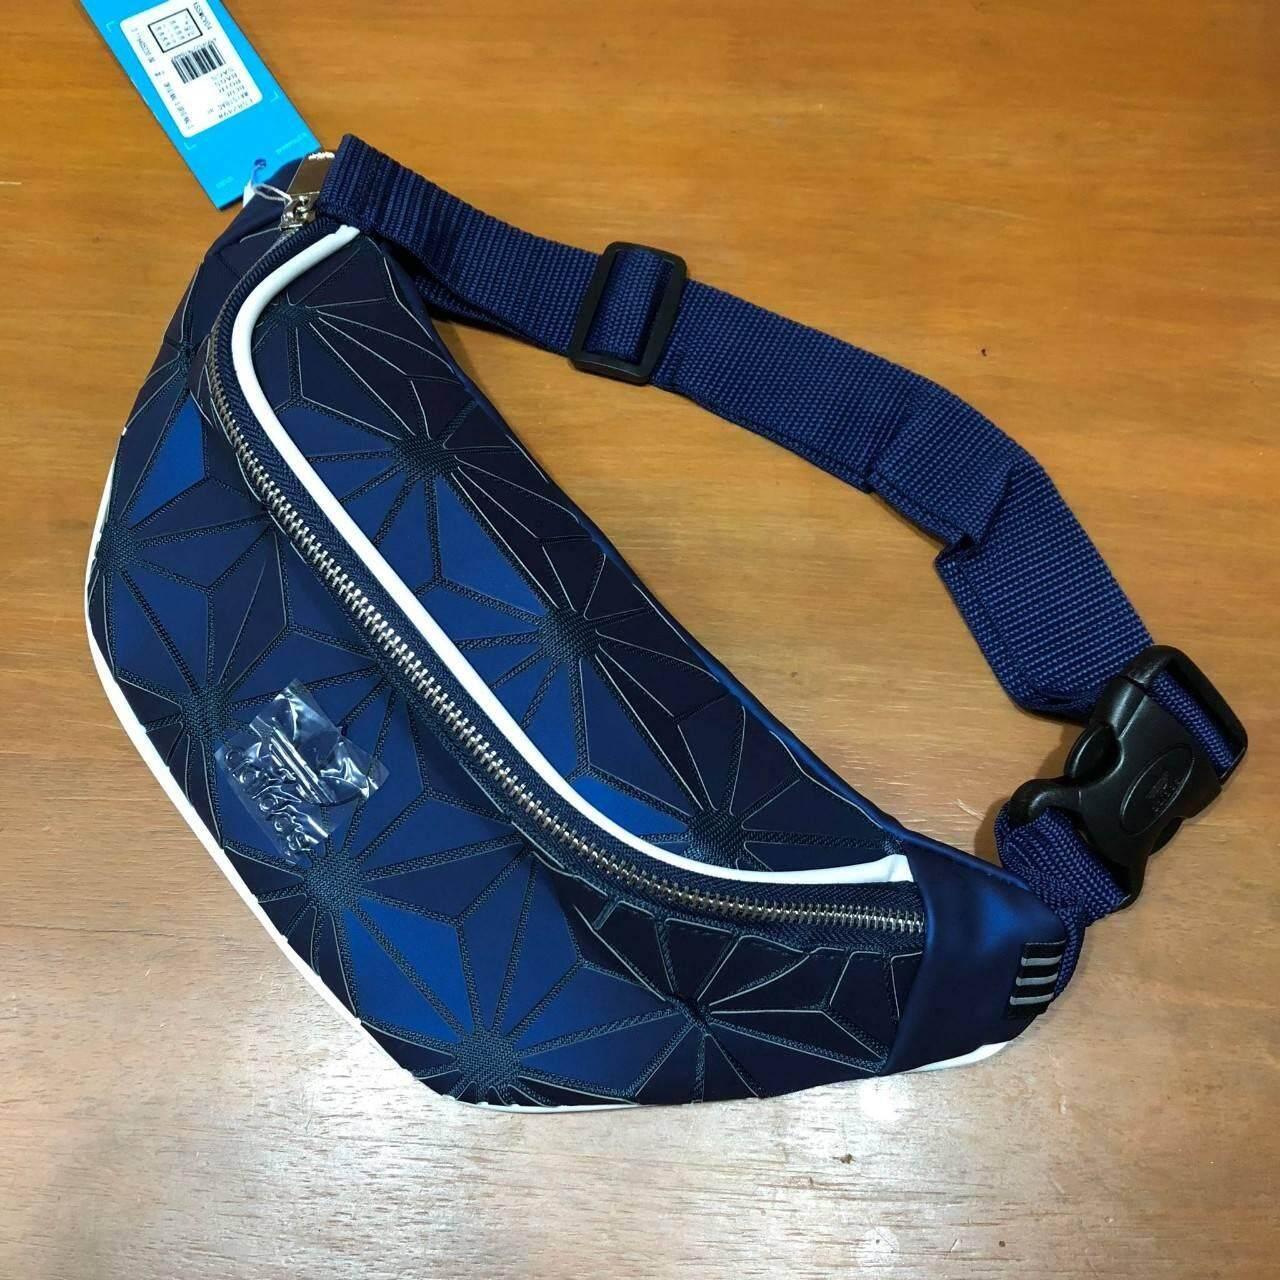 08251ff98ee8 Adidas Originals 3D Mini Airline (ISSEY MIYAKE Style Shoulder Bag)  กระเป๋าสะพายสไตล์สปอร์ตแบบคาดเอวคาดอกรุ่นใหม่ (งานแบรด์แท้ 100%)